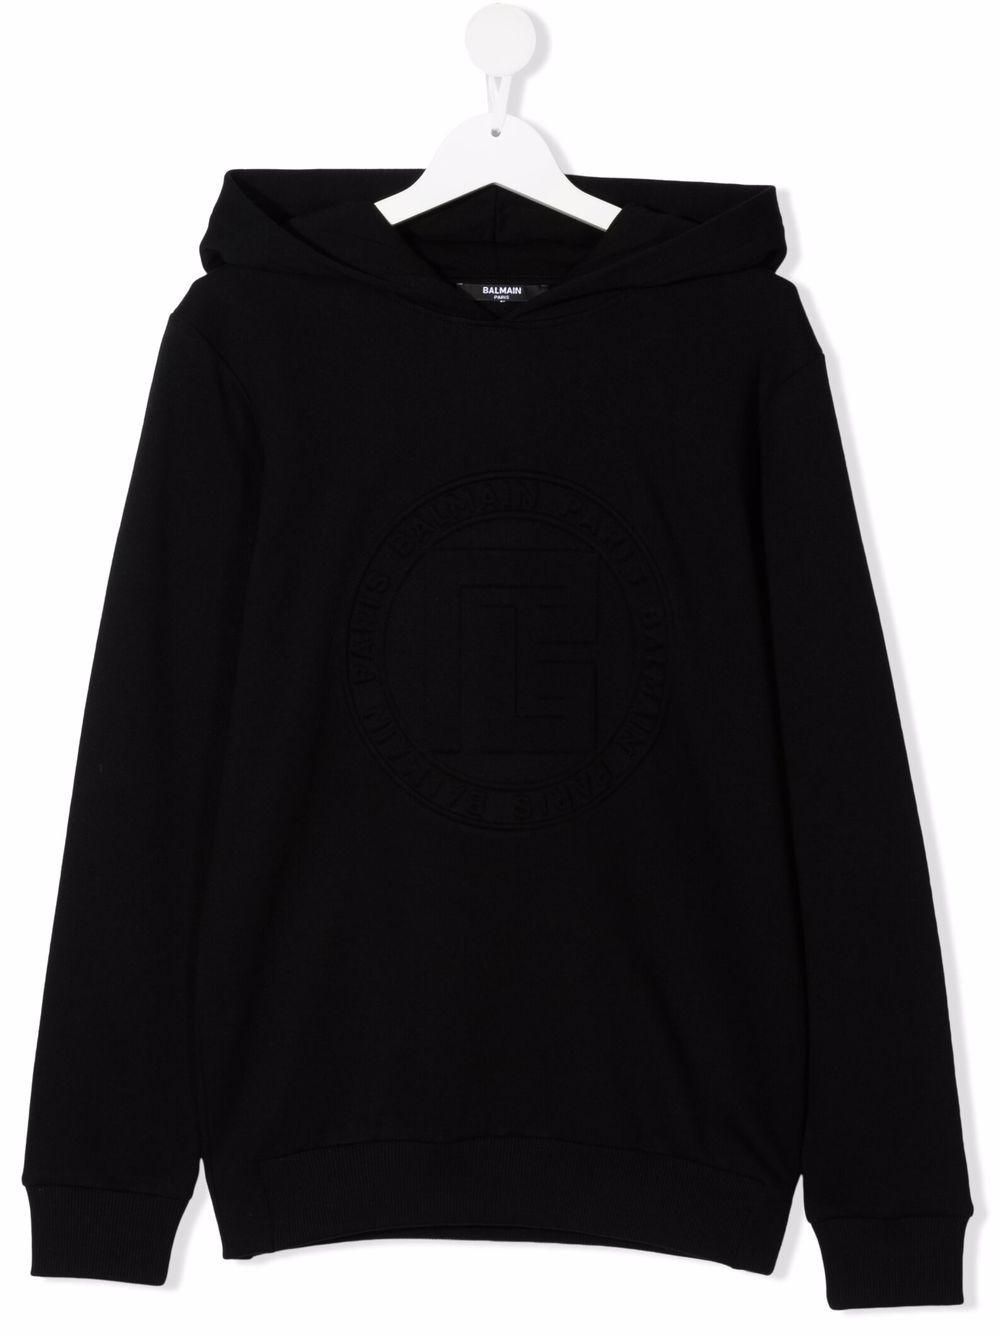 Sweatshirt Balmain kids BALMAIN PARIS KIDS | -108764232 | 6P4590Z0001930T